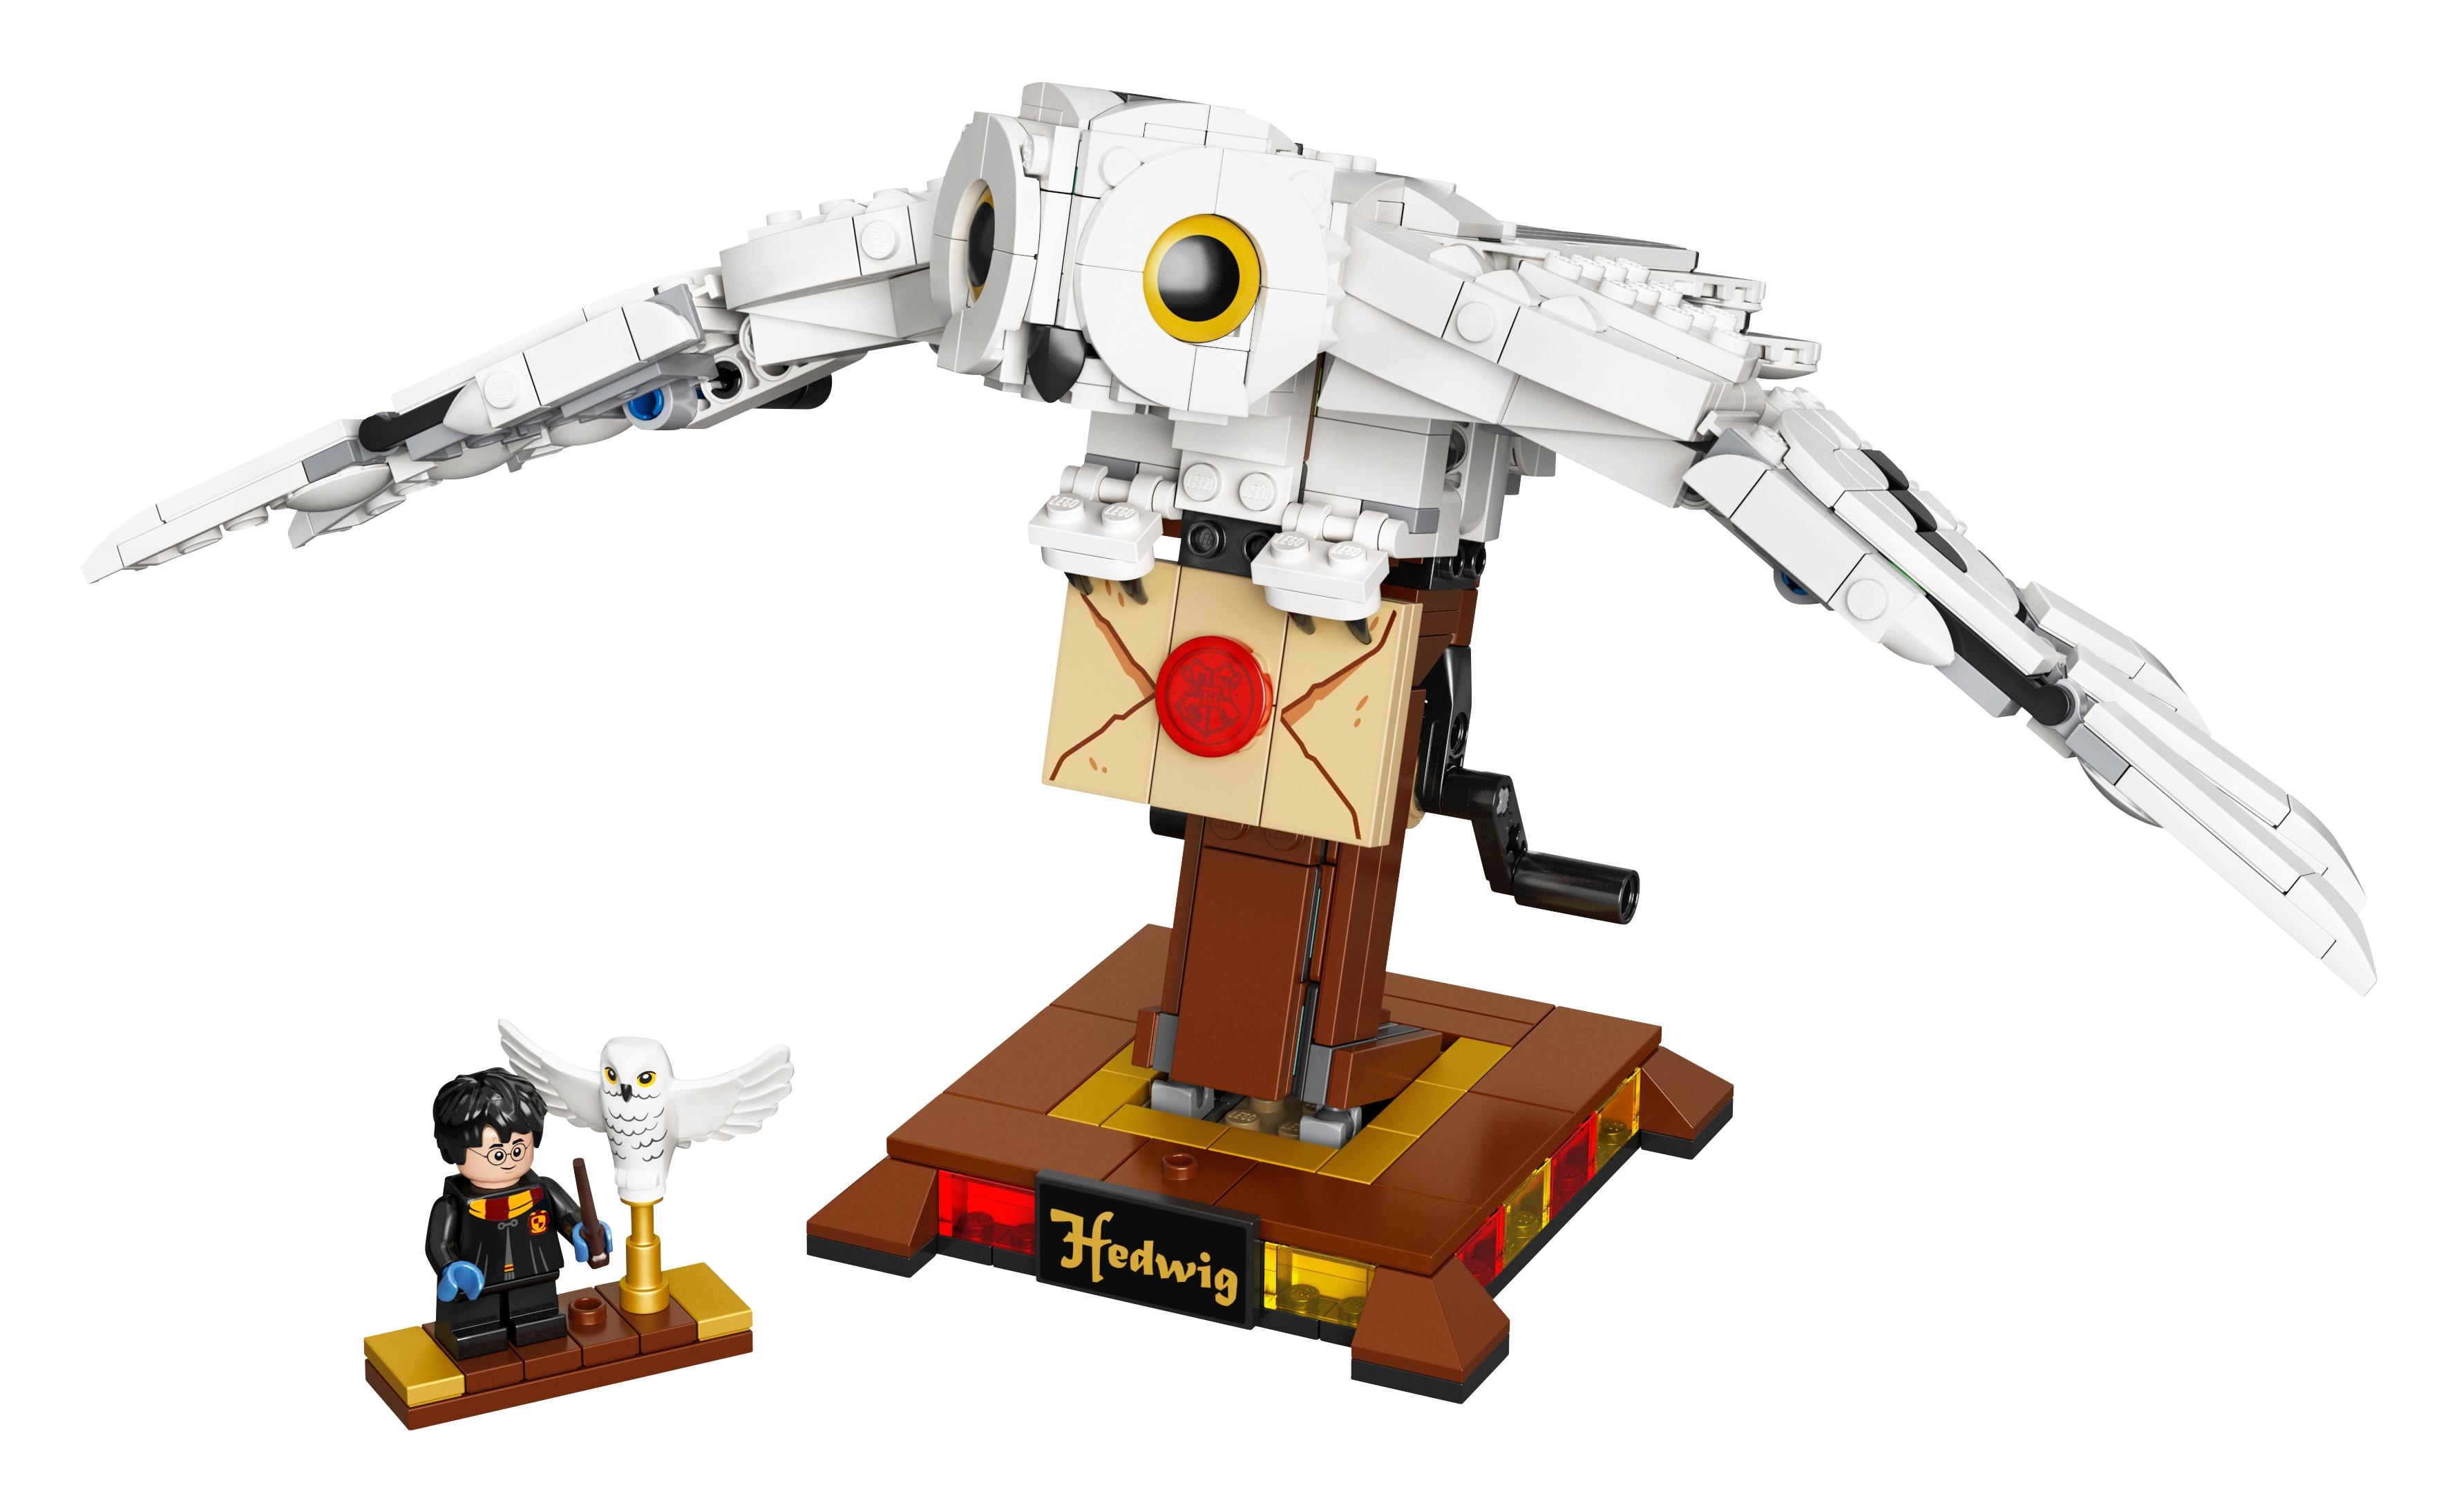 kereskedő robot nostradamus